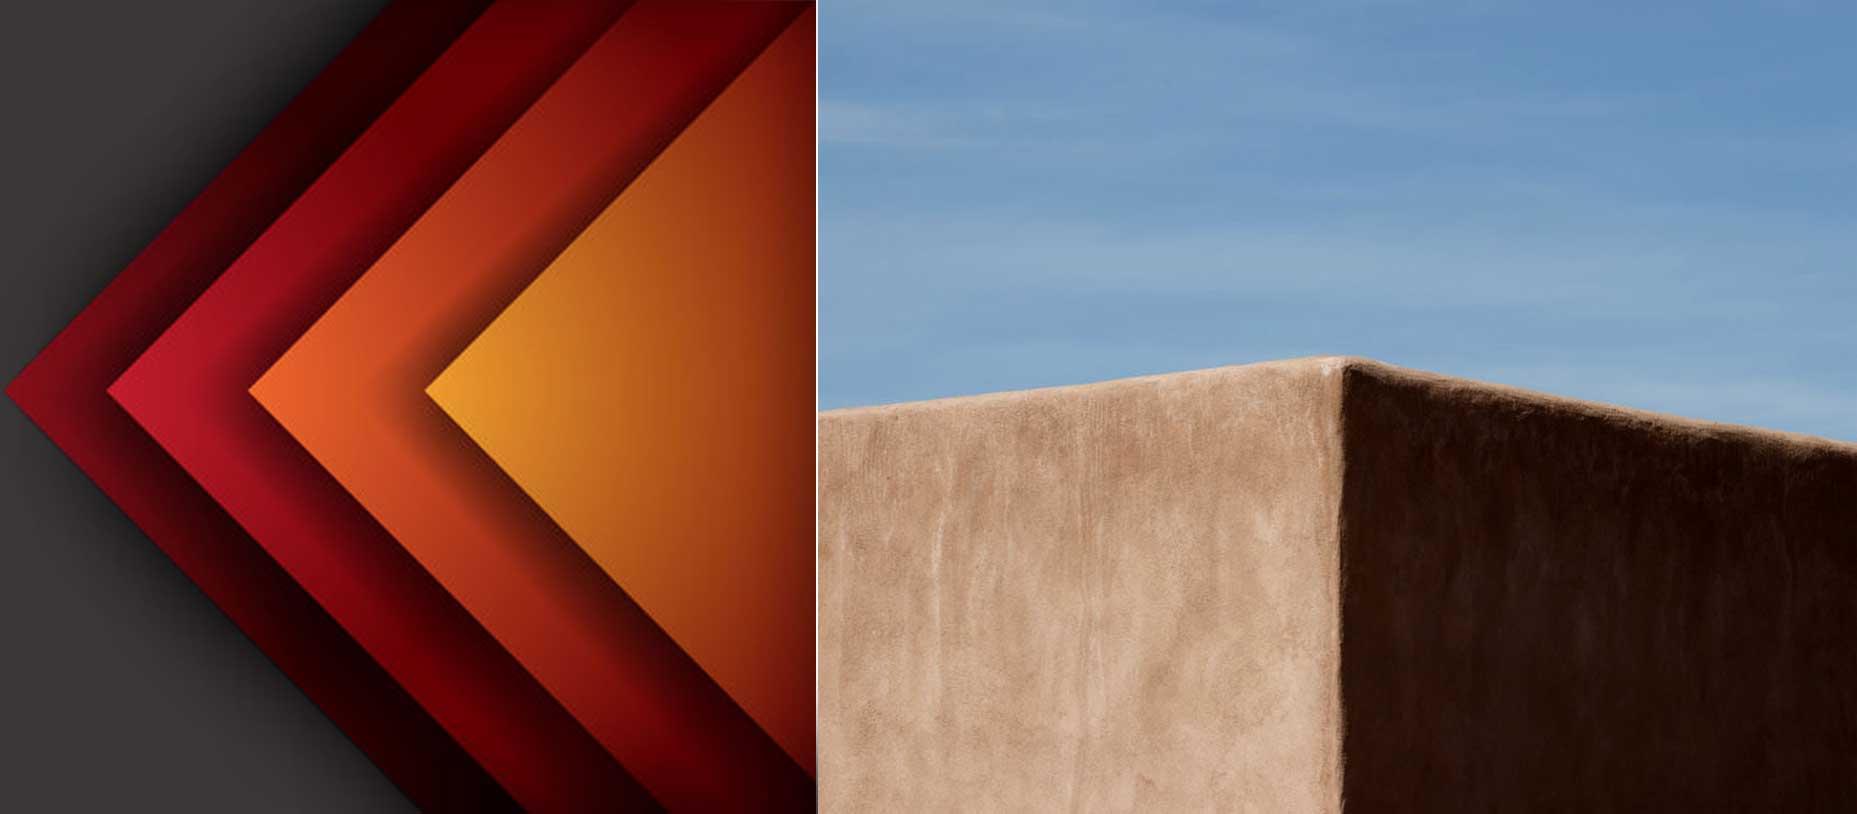 Abstract  Photography6 - 35 ایده و راهنما برای عکاسی انتراعی